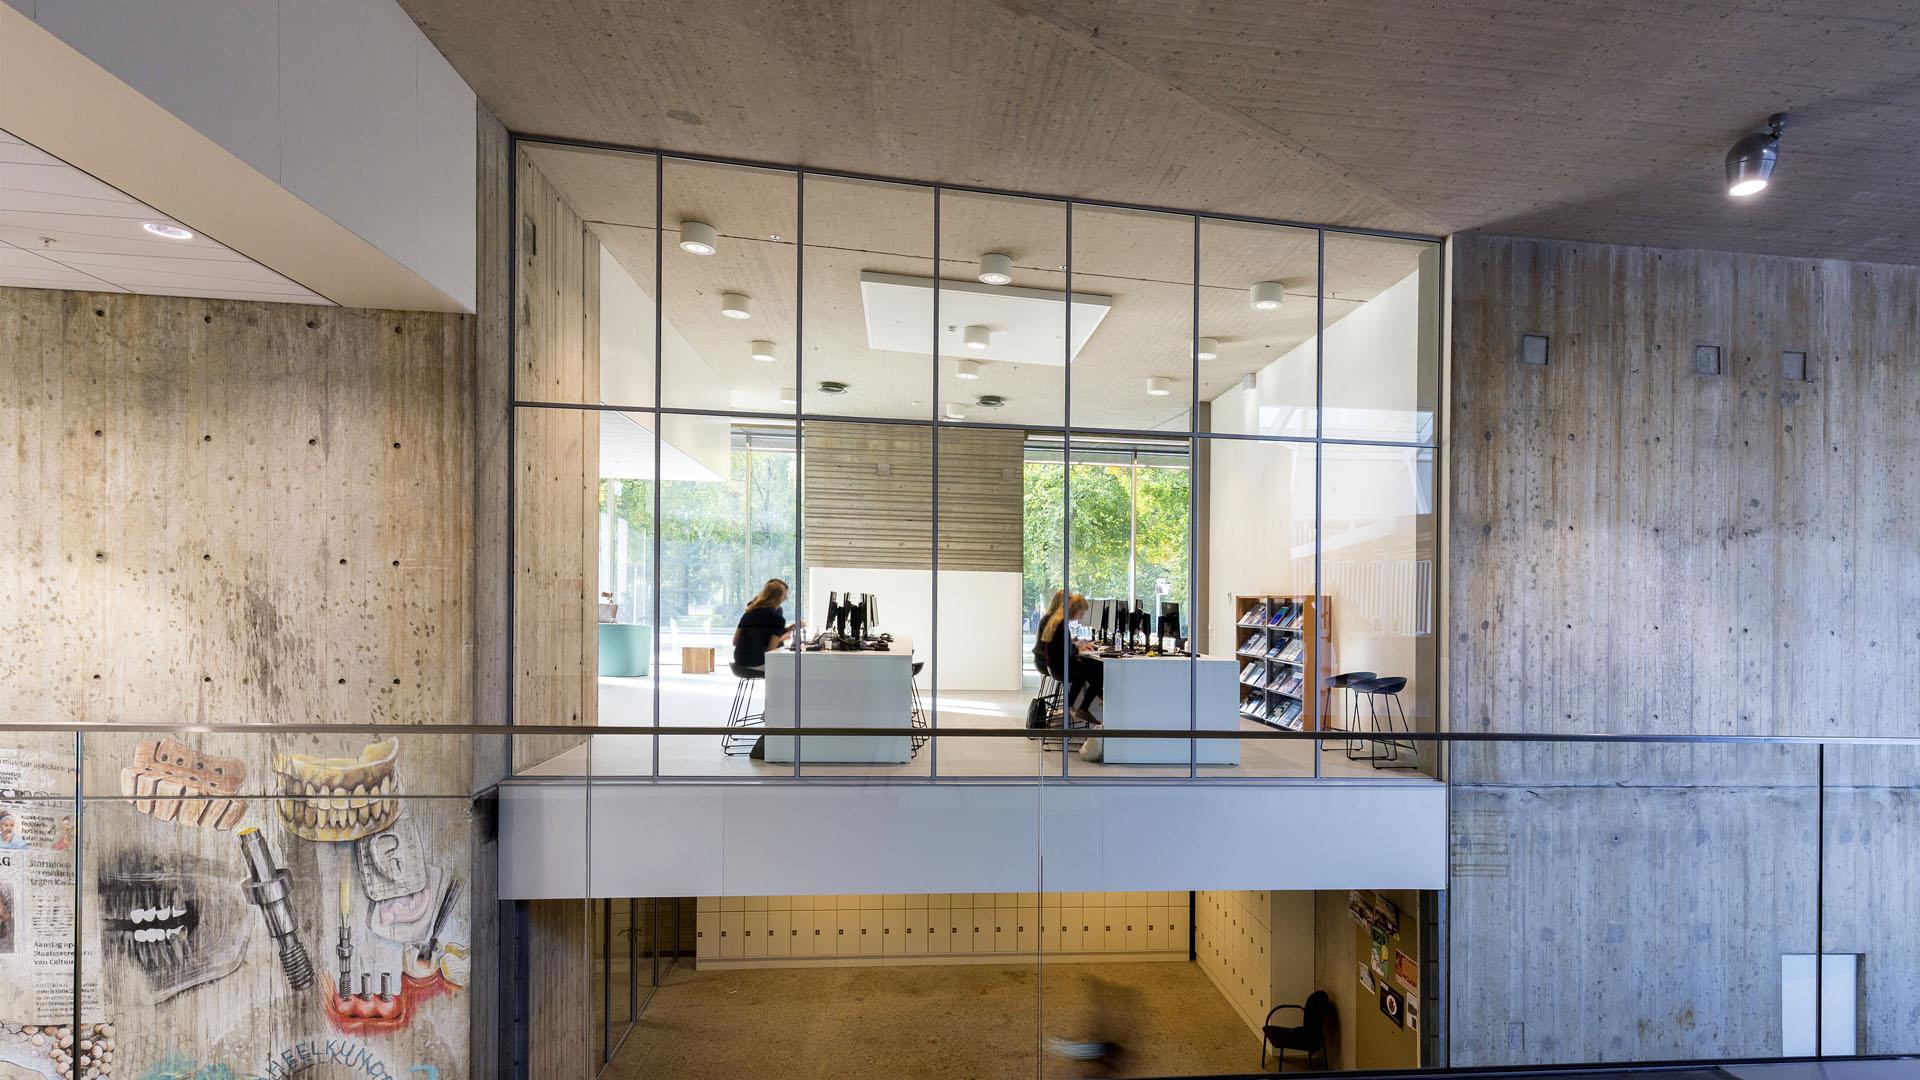 Interior glass walls at the Radboud University of dentist in Nijmegen, the Netherlands